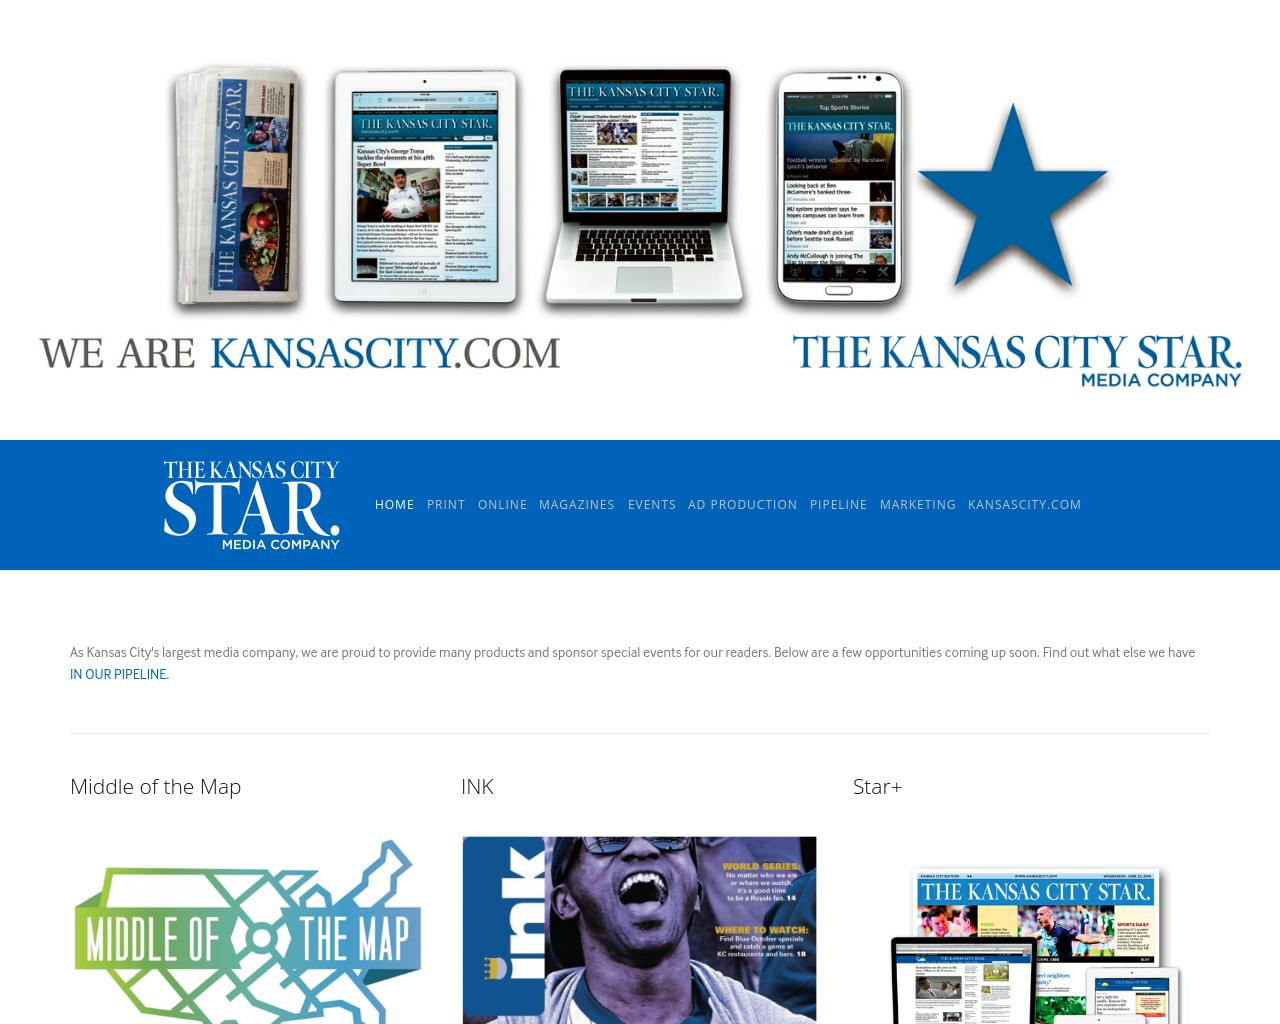 The-Kansas-City-Star-Media-Company-Advertising-Reviews-Pricing